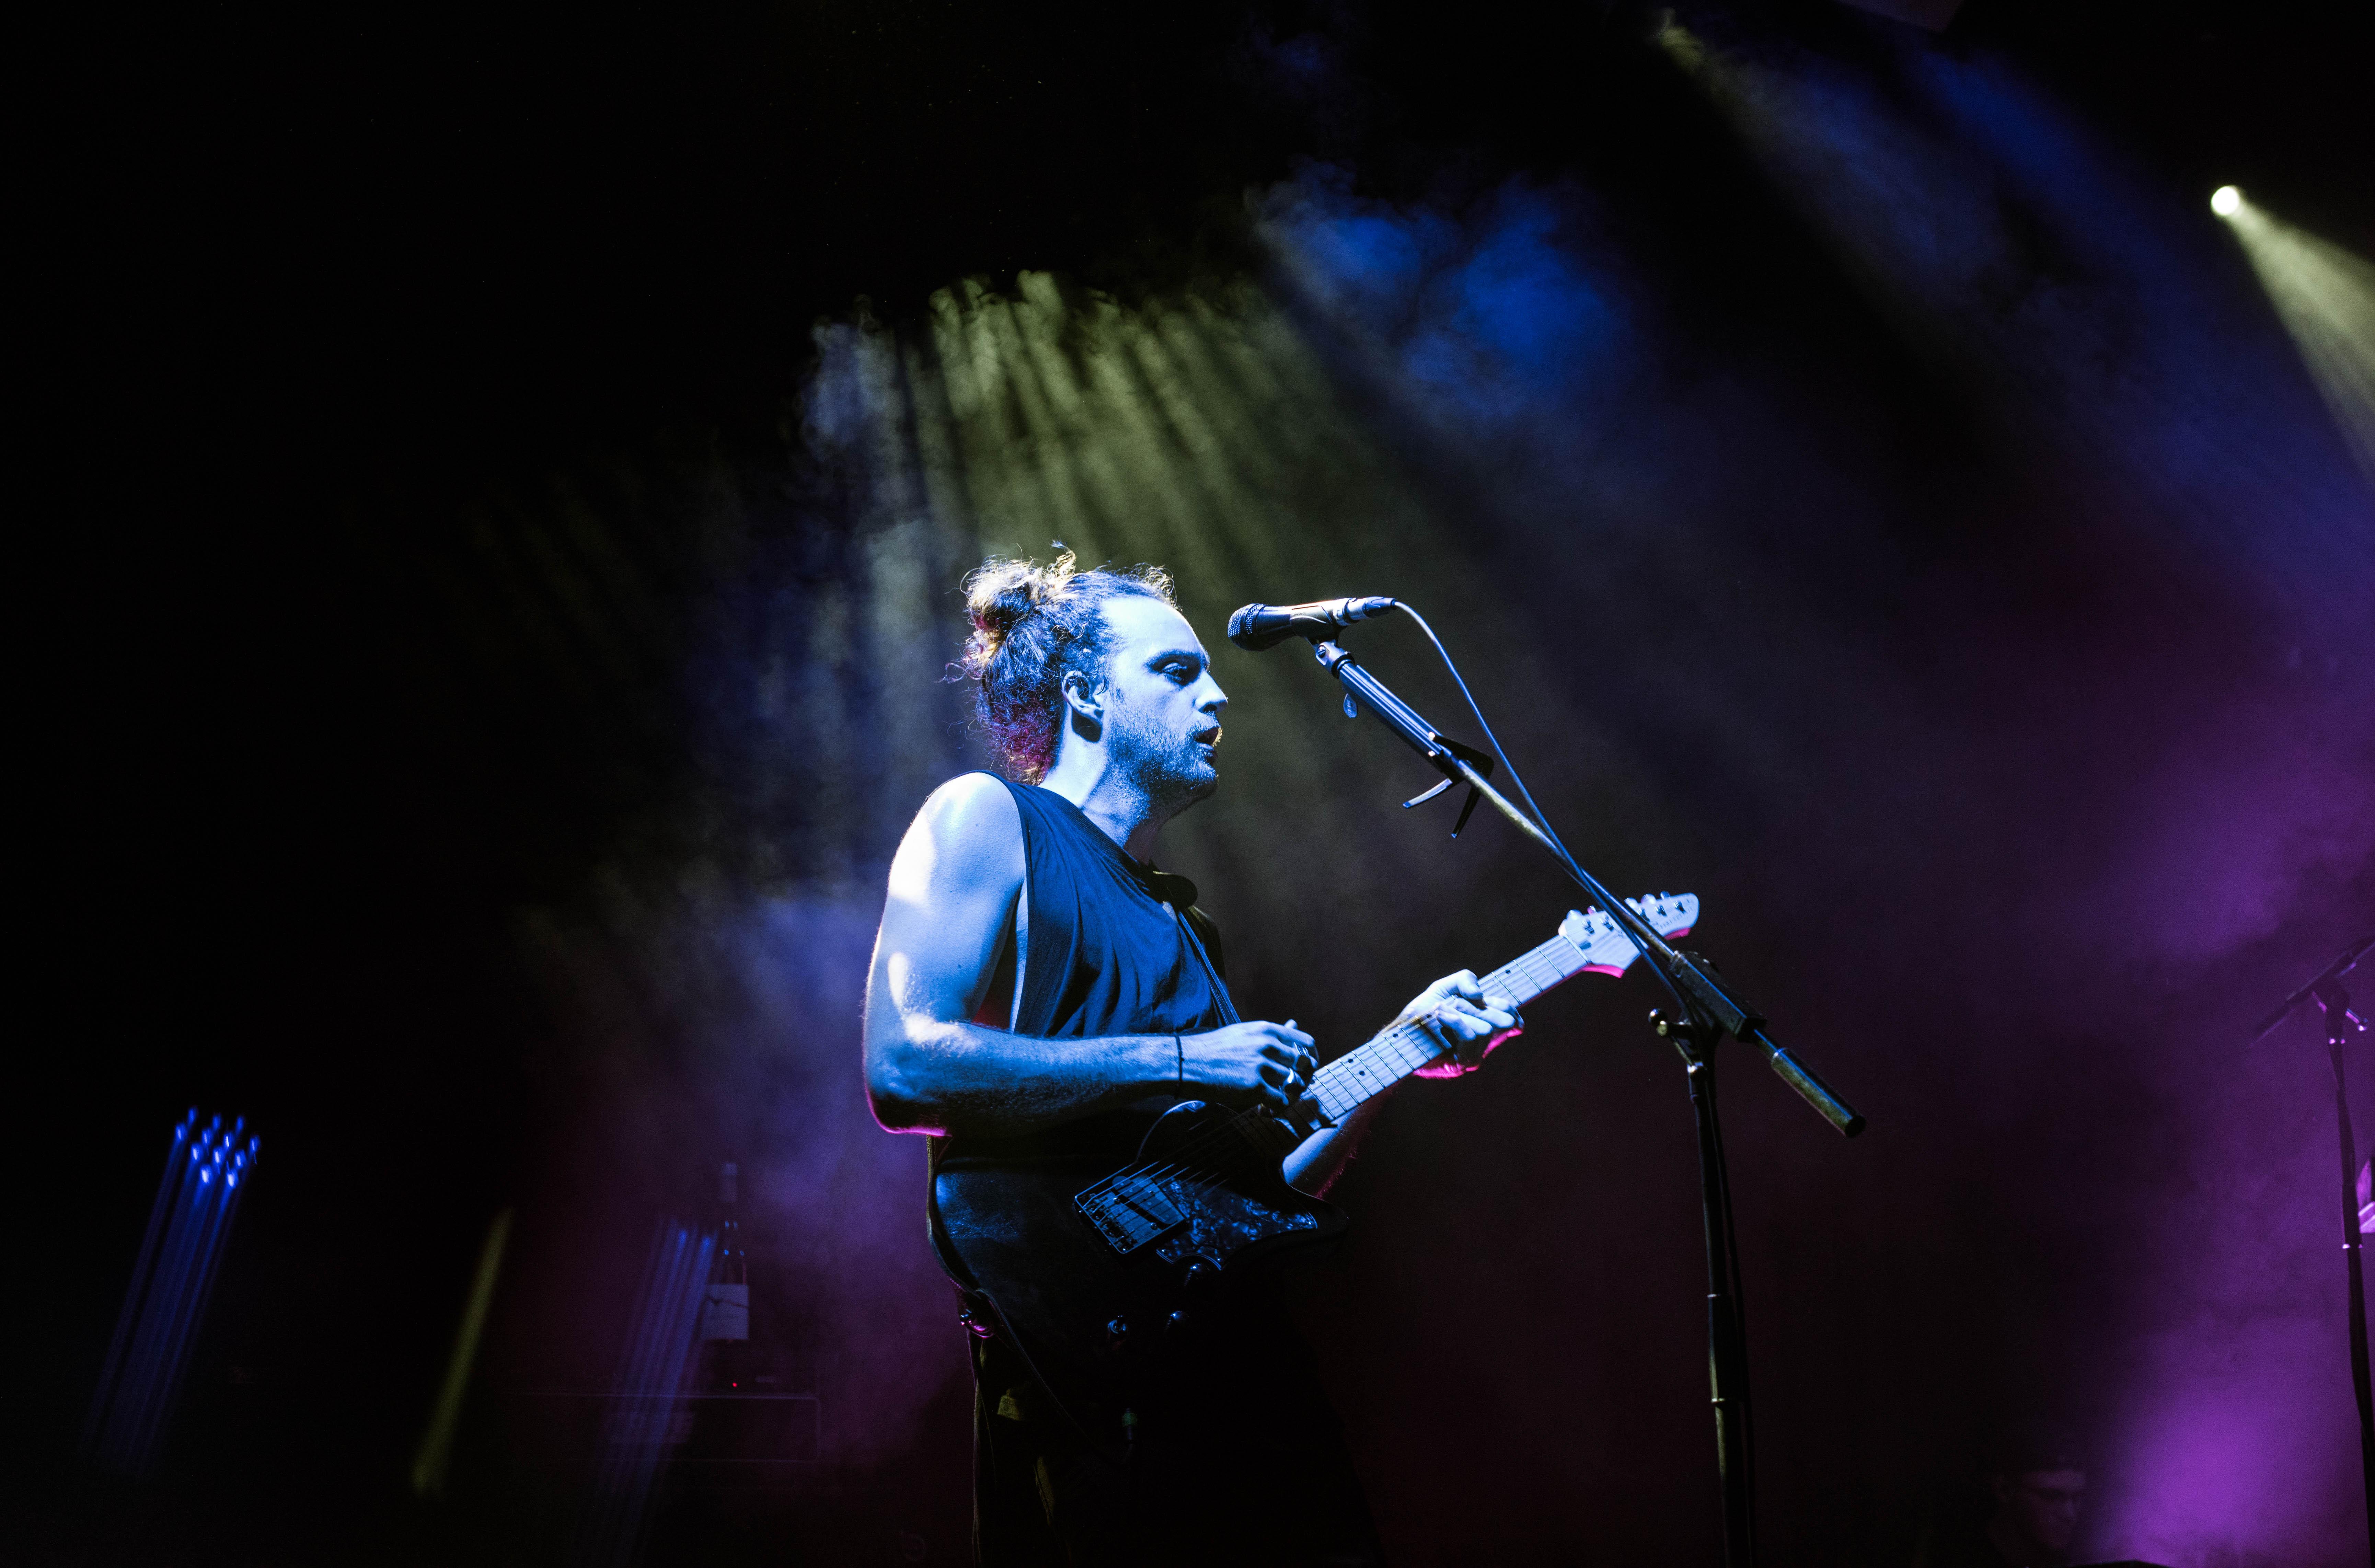 boo-seeka-music-live-review-sydney-photo-credit-dominique-burns-blackwell-savage-thrills-savagethrills